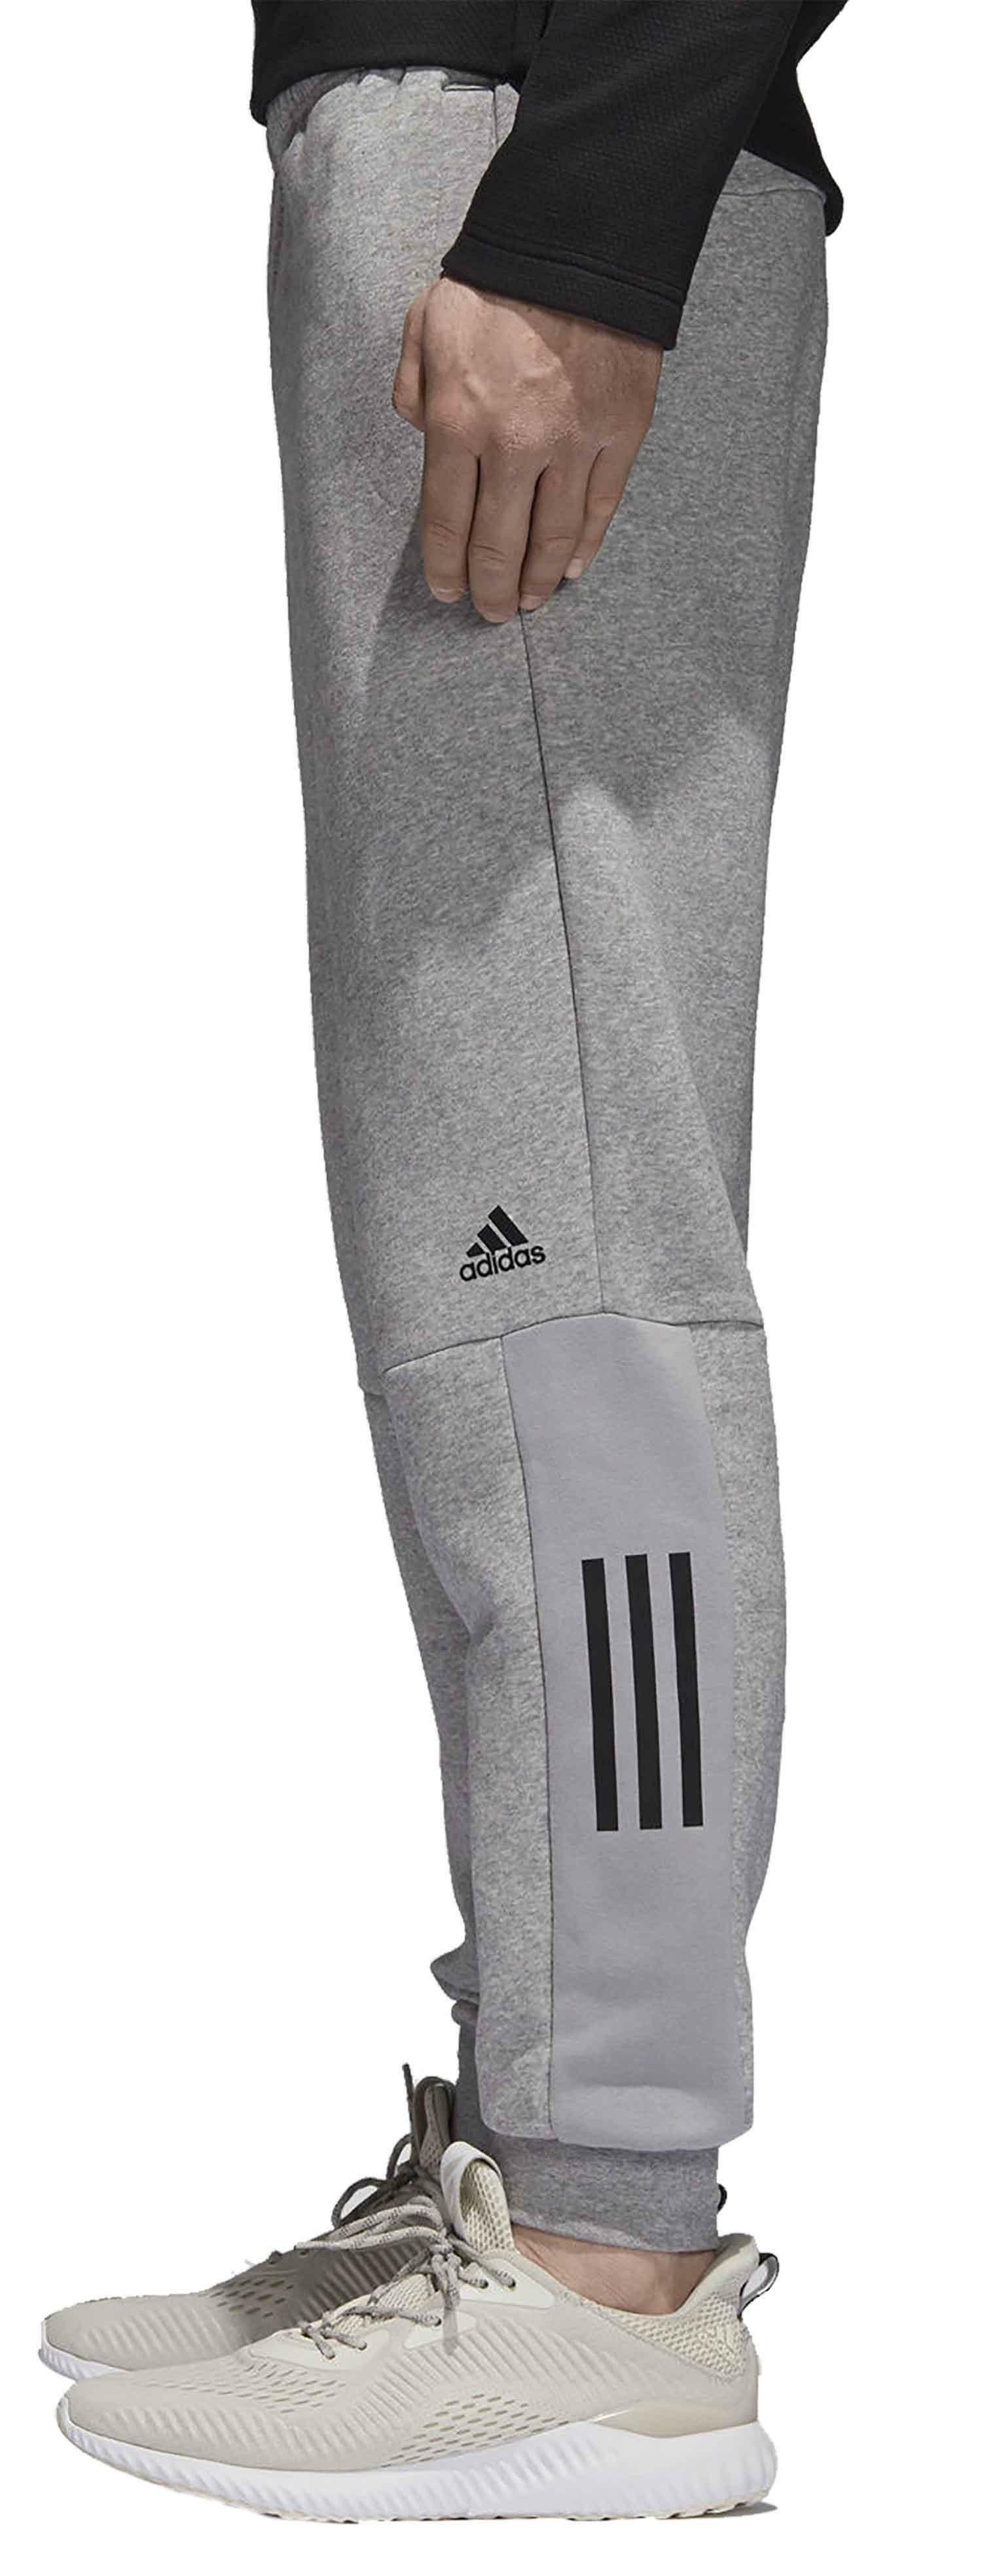 adidas originals adidas m sid lgo pantaloni tuta uomo grigi cotone felpato dm7275